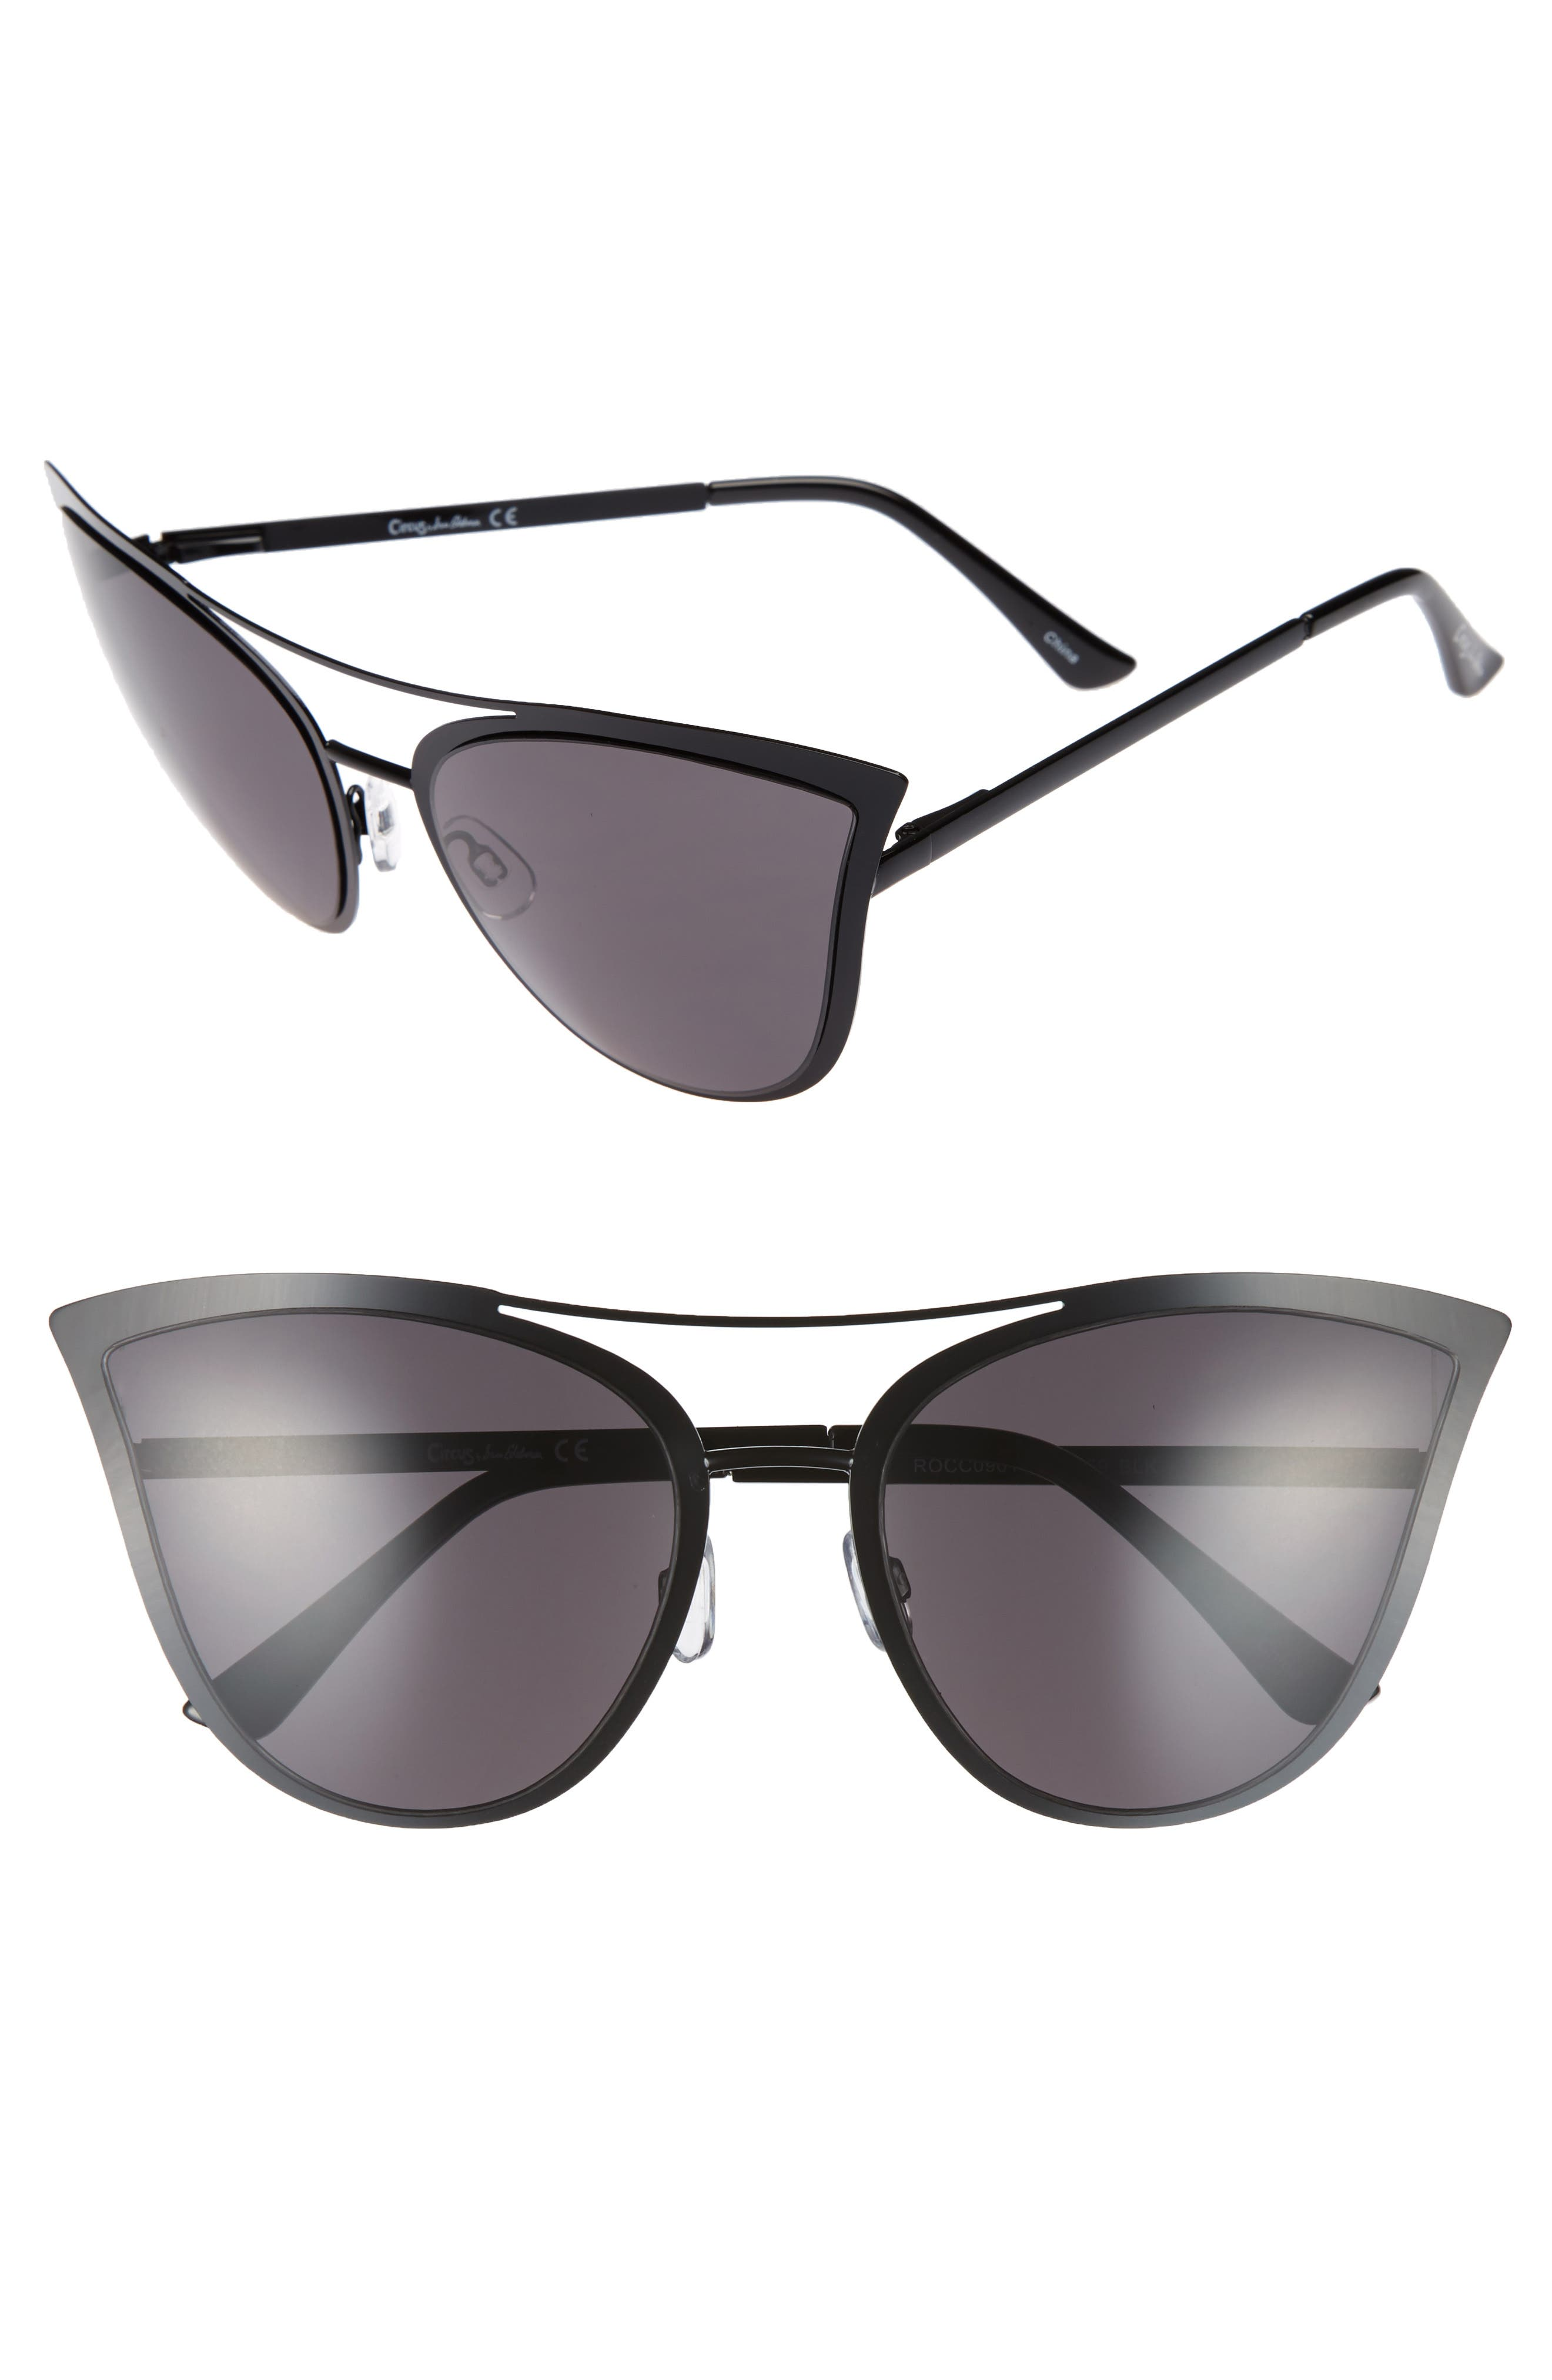 61mm Metal Cat Eye Sunglasses,                             Main thumbnail 1, color,                             001